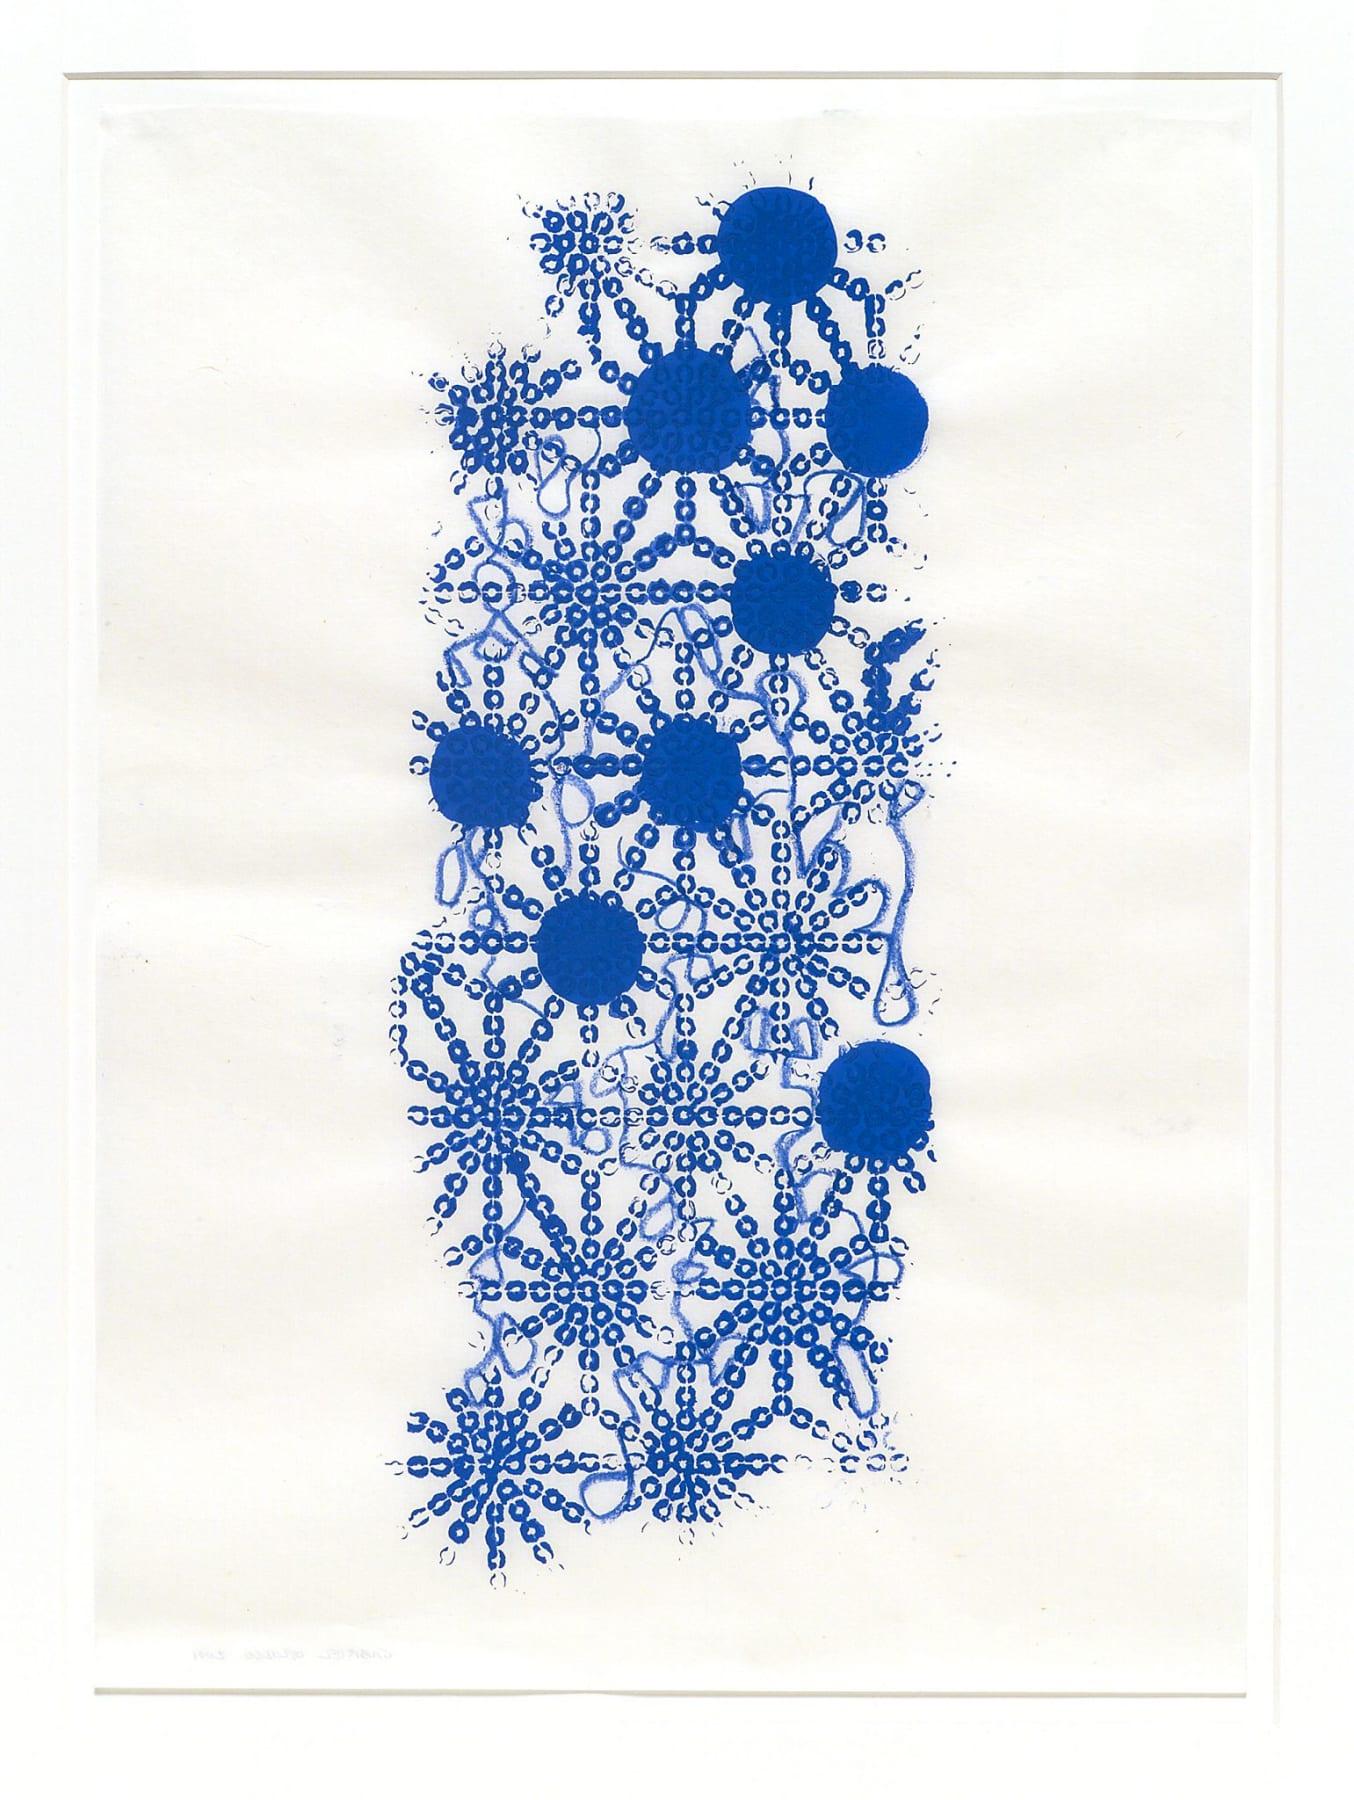 Gabriel Orozco, Katagami Prints 3, 2001